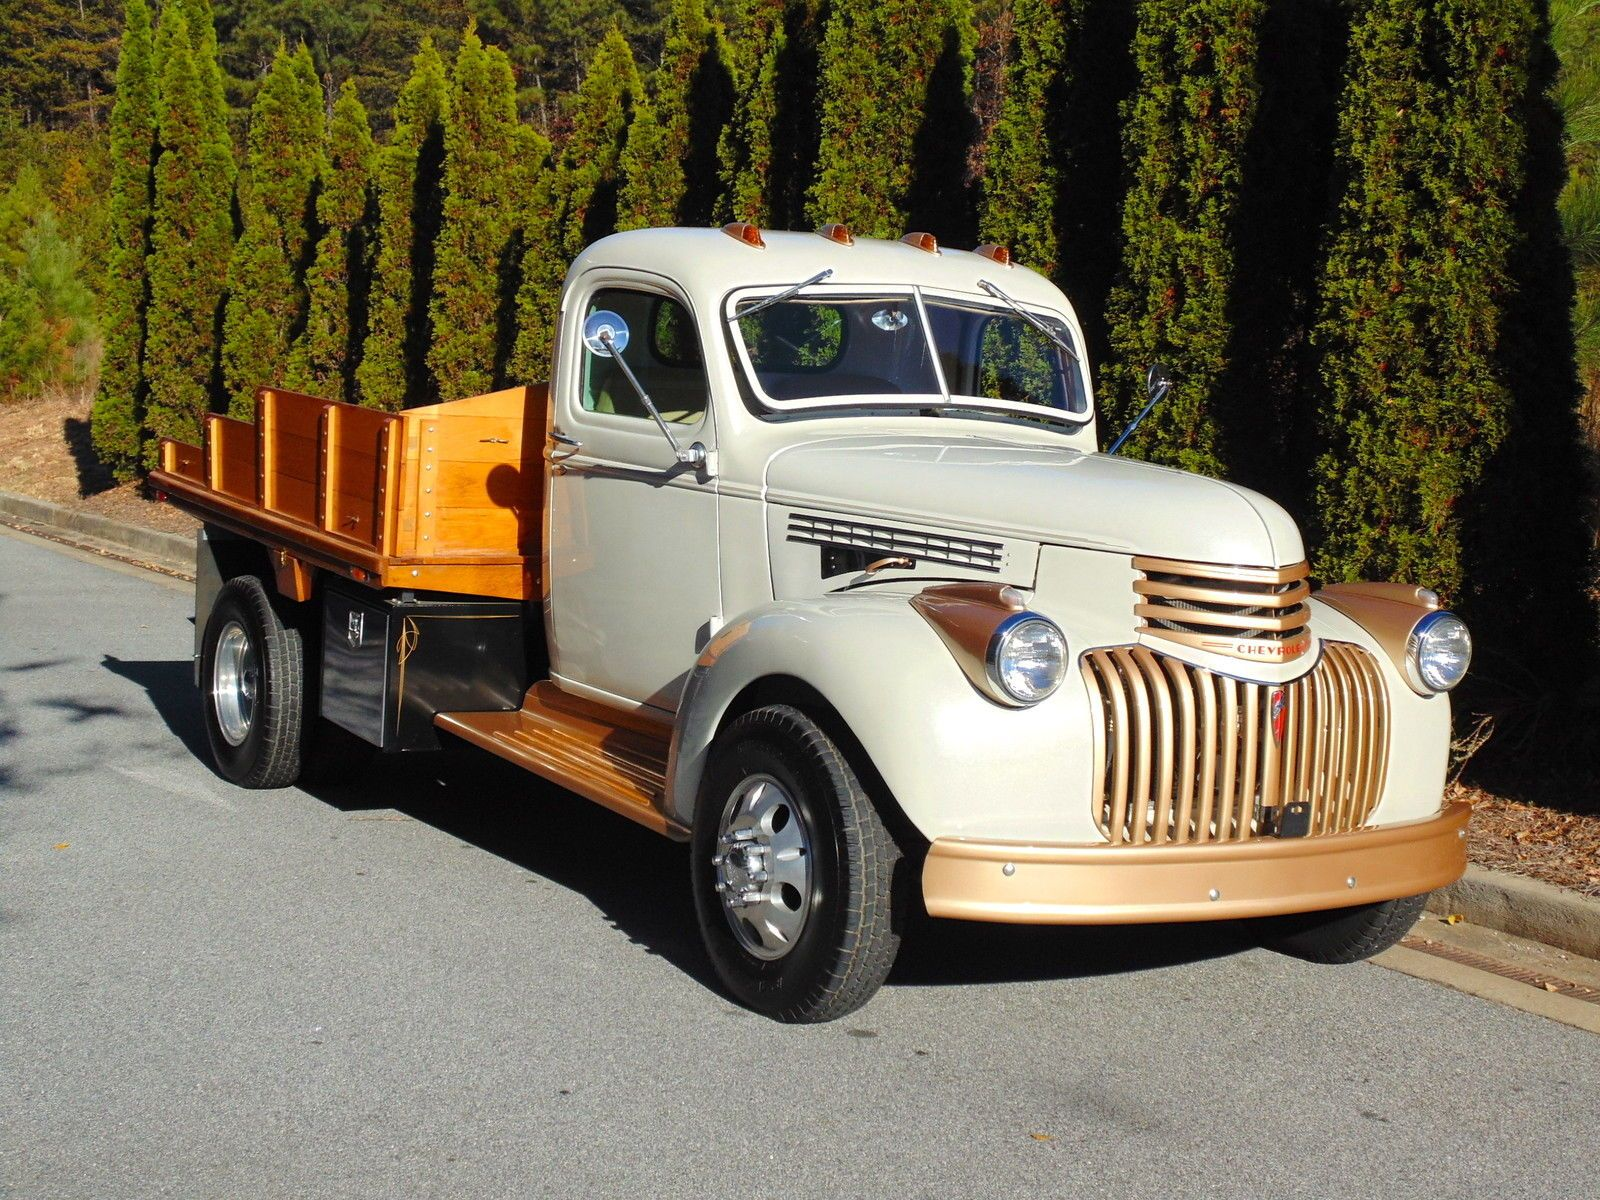 1946 Chevrolet 1Ton Chevrolet trucks, Trucks, Chevrolet